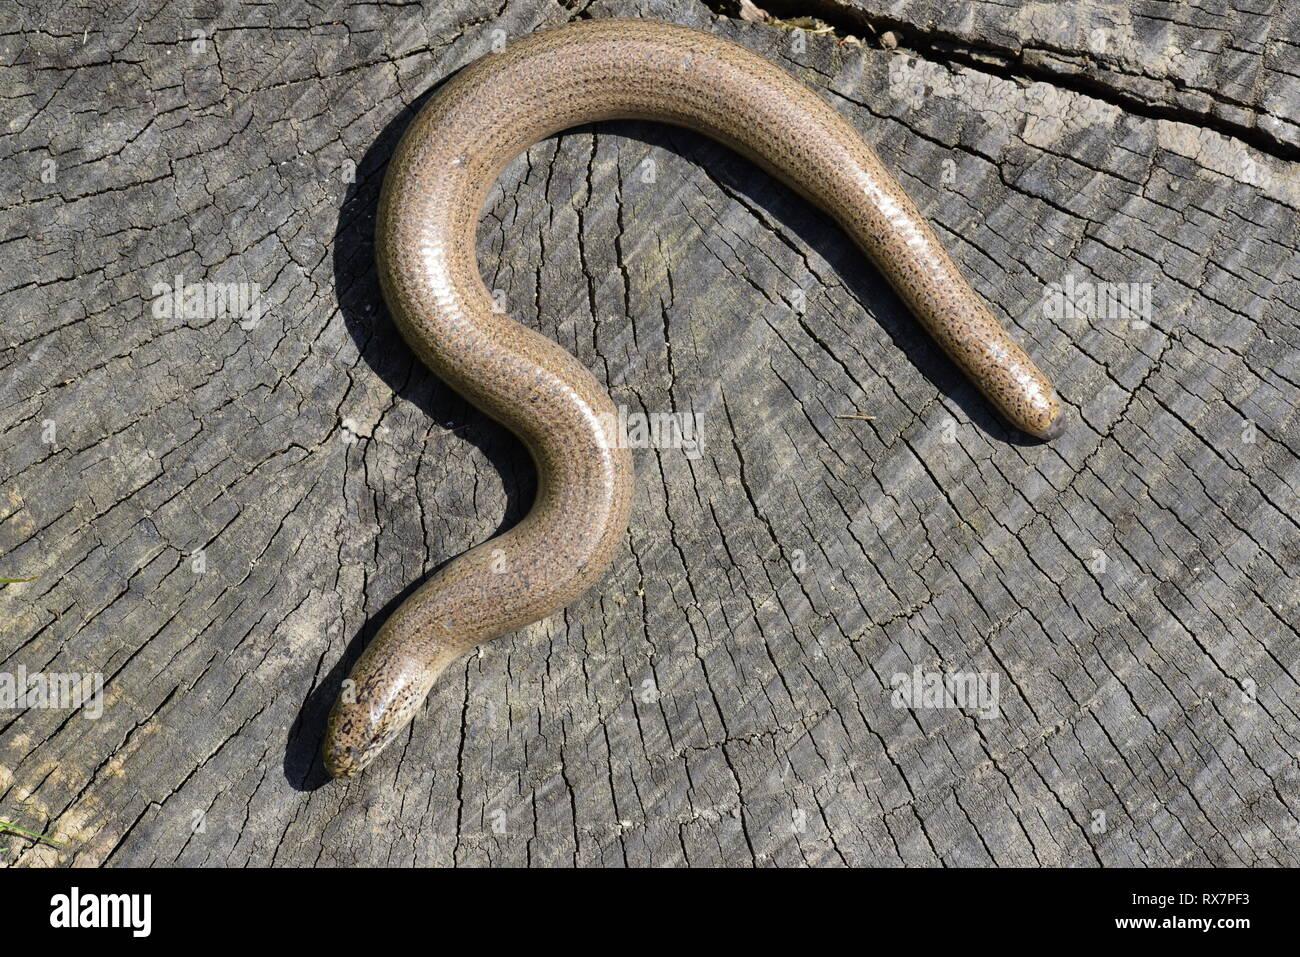 Slowworm, Anguis fragilis, basking in sunshine to get warm, Monkton Nature Reserve, Kent UK,legless lizard - Stock Image